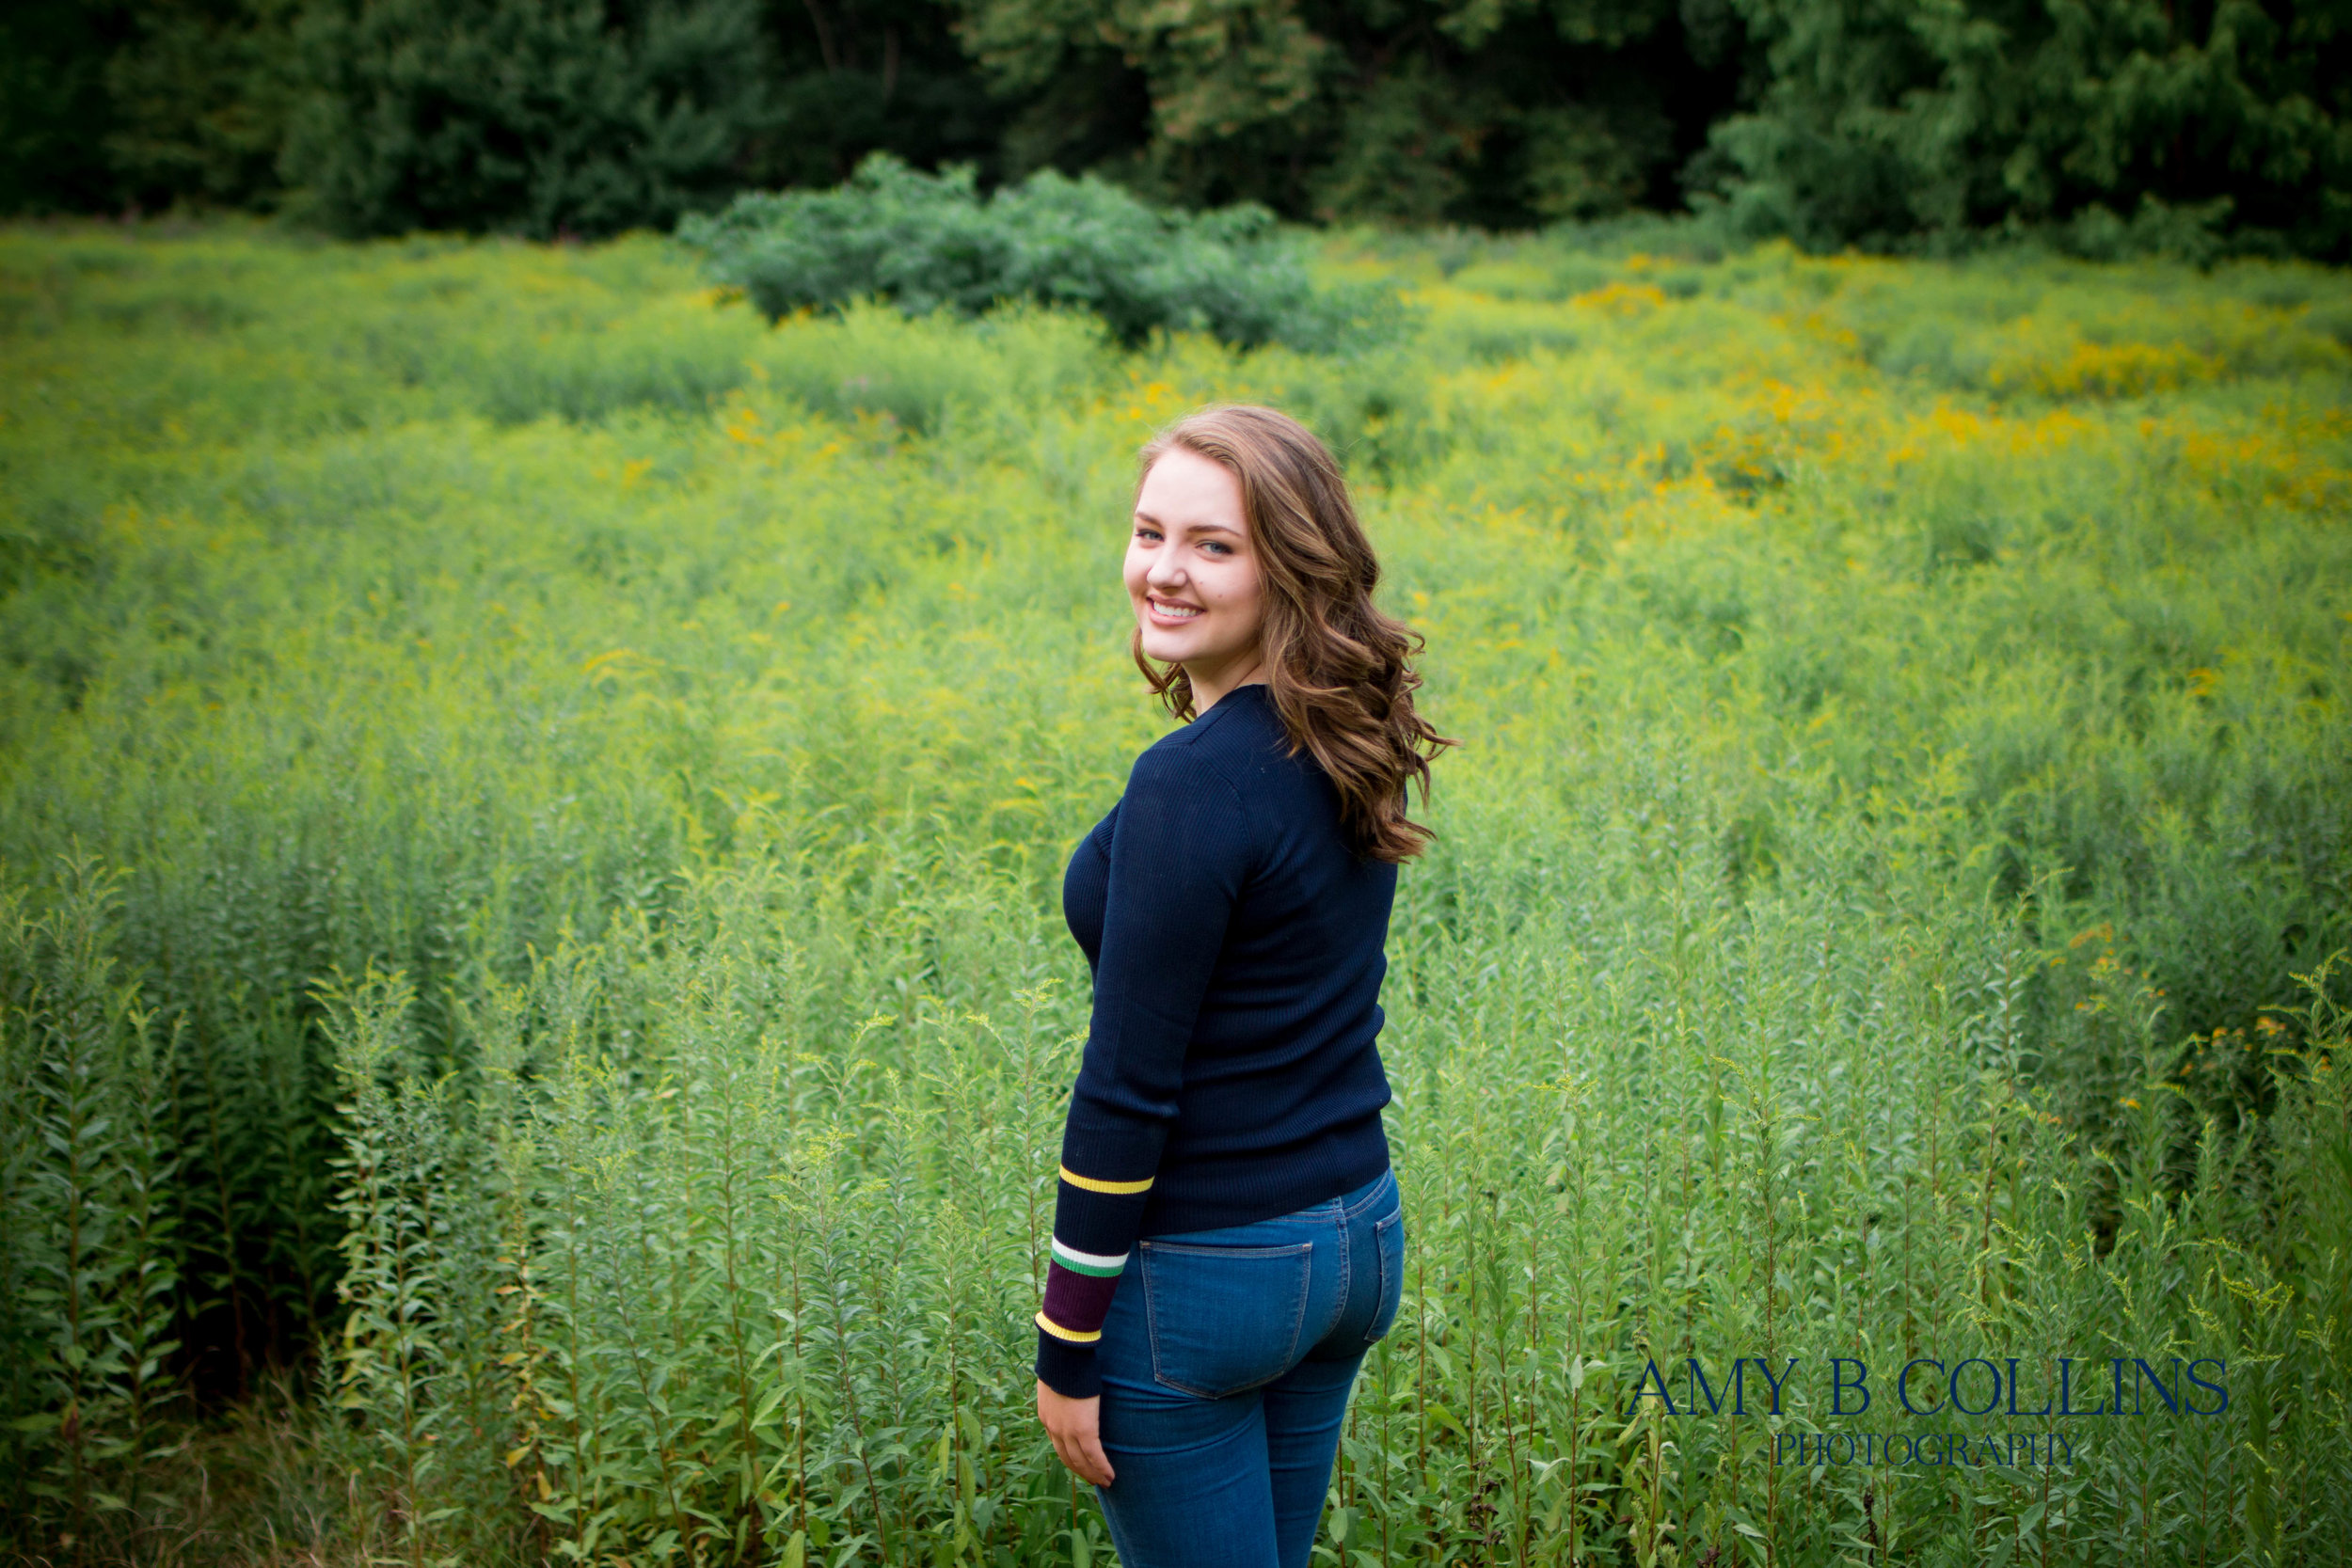 AmyBCollinsPhotography_SeniorSession_Sasha-6.jpg